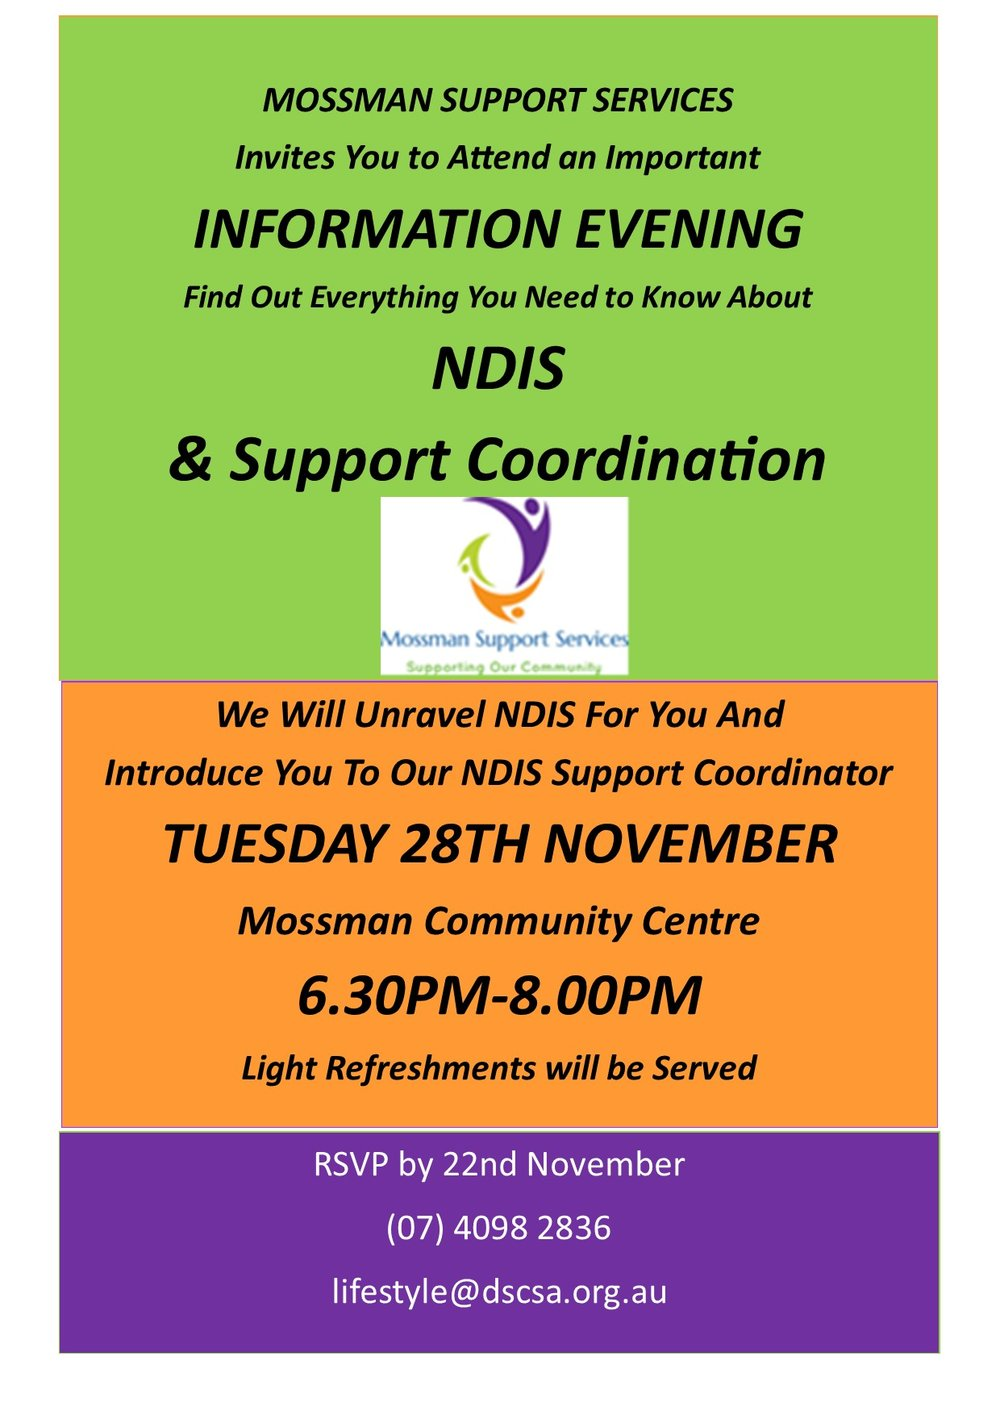 NDIS Support Coordination Information Evening.jpg